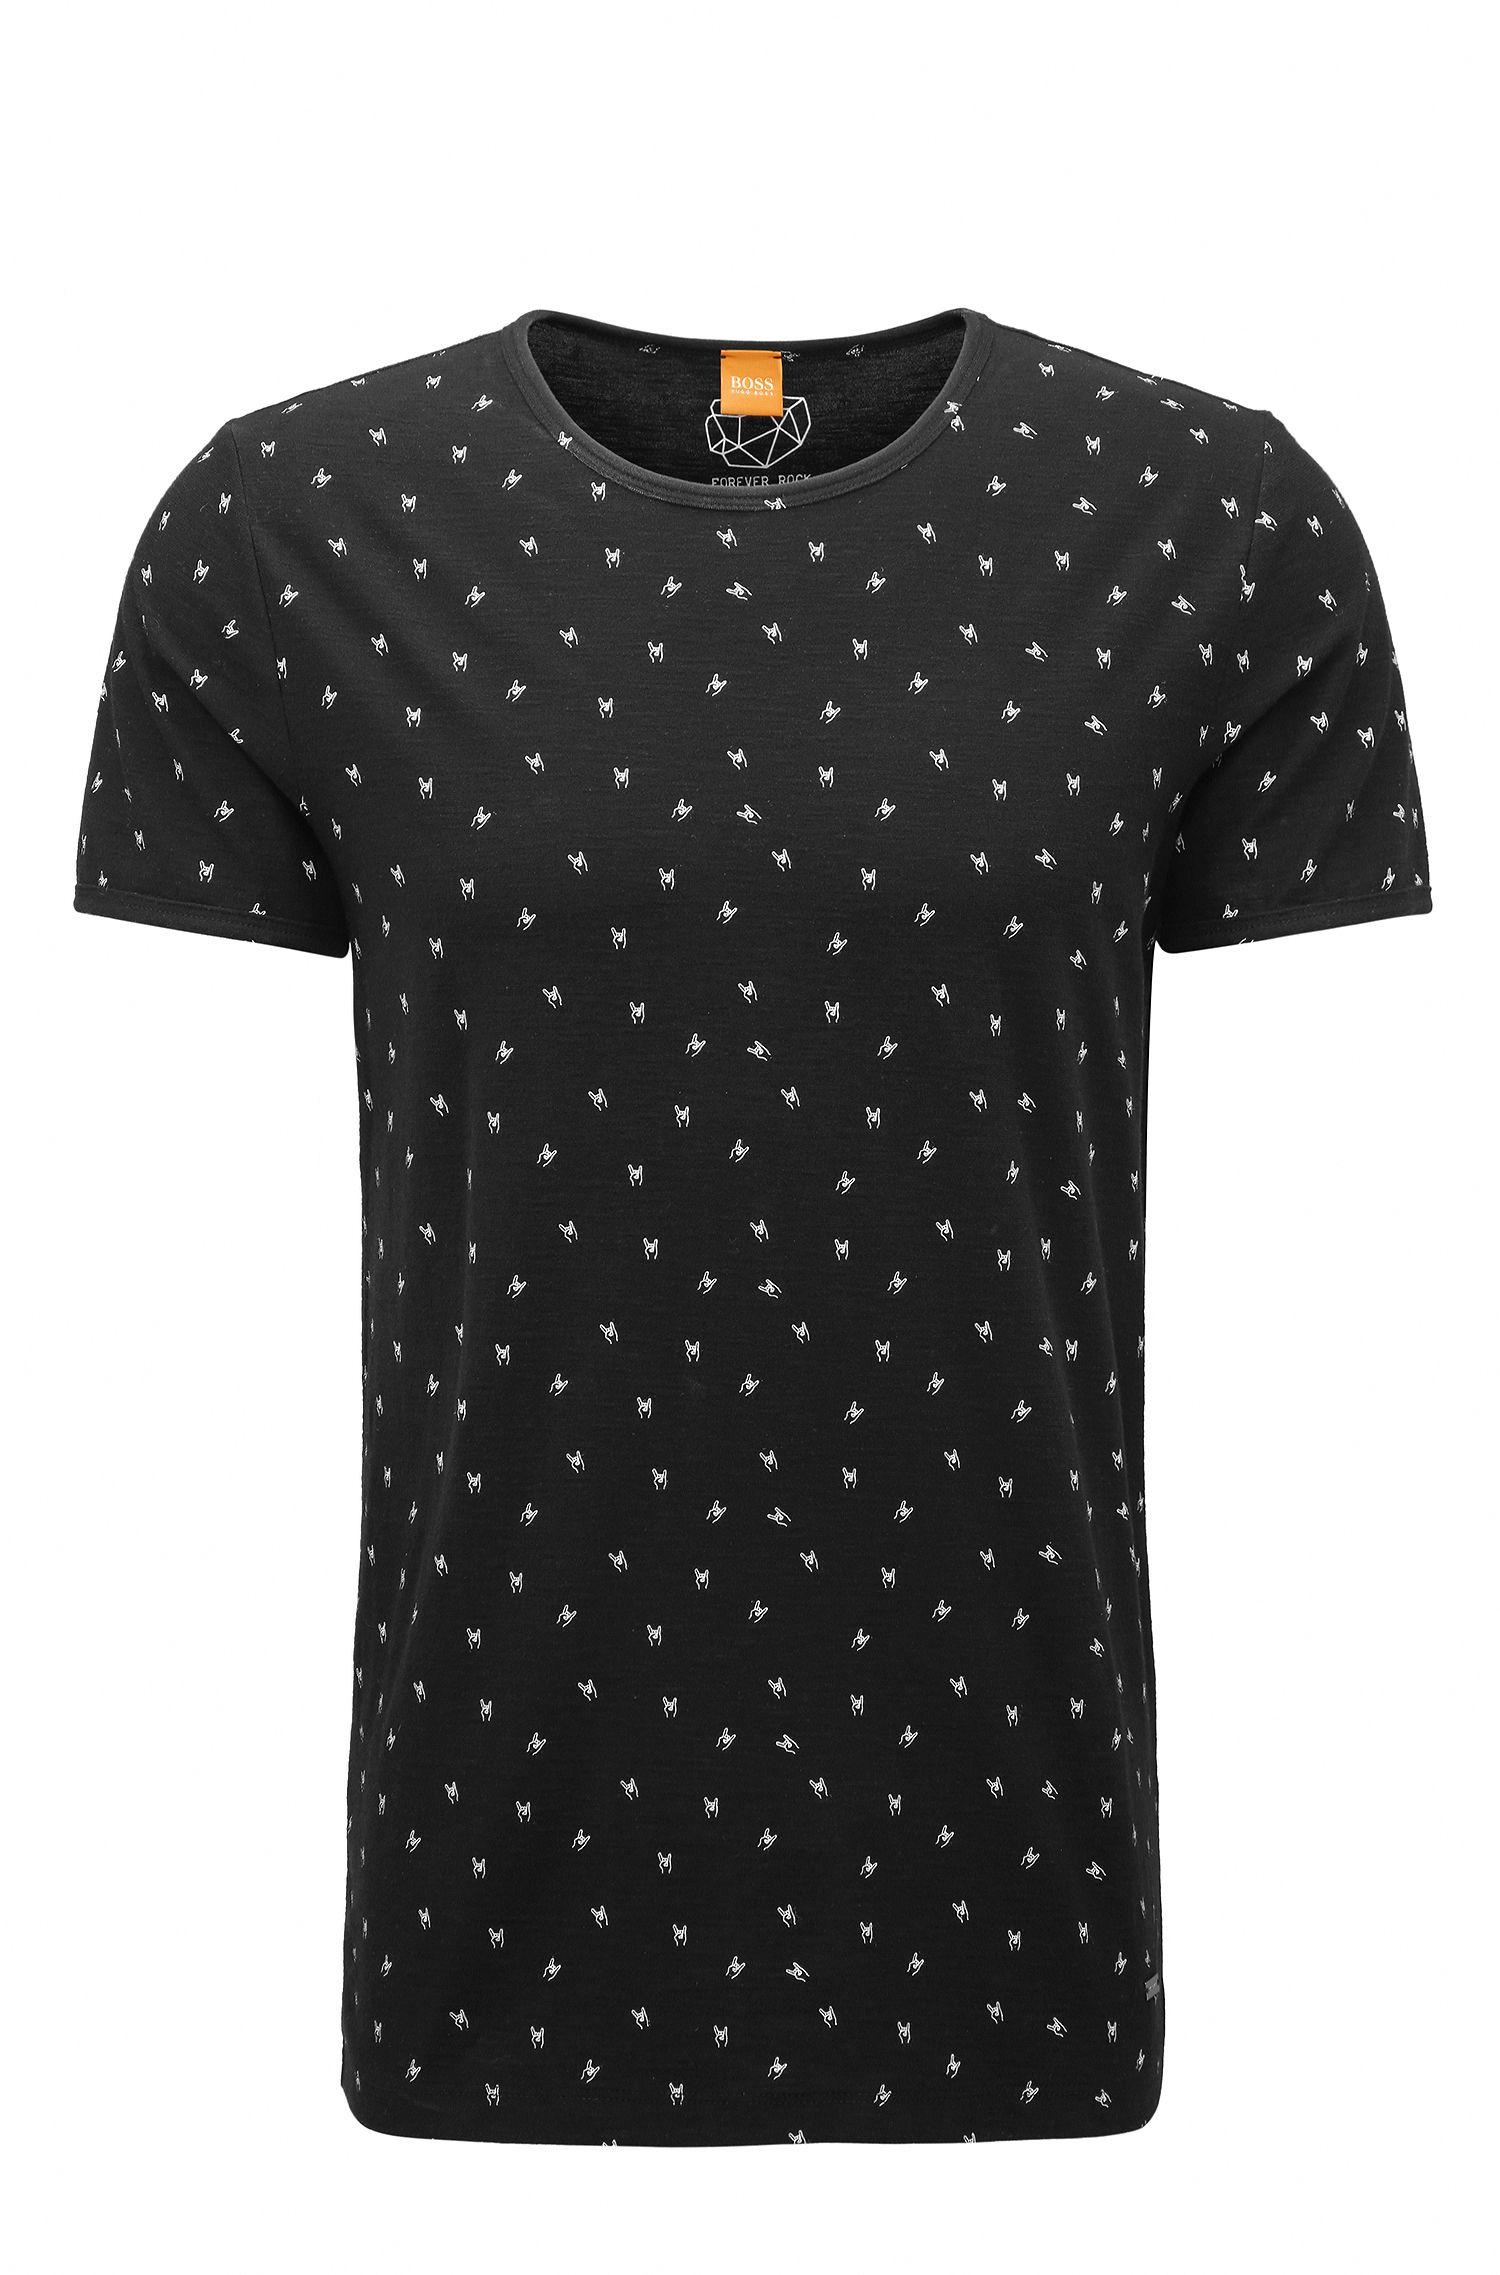 Printed Slub Jersey T-Shirt | Thoughts